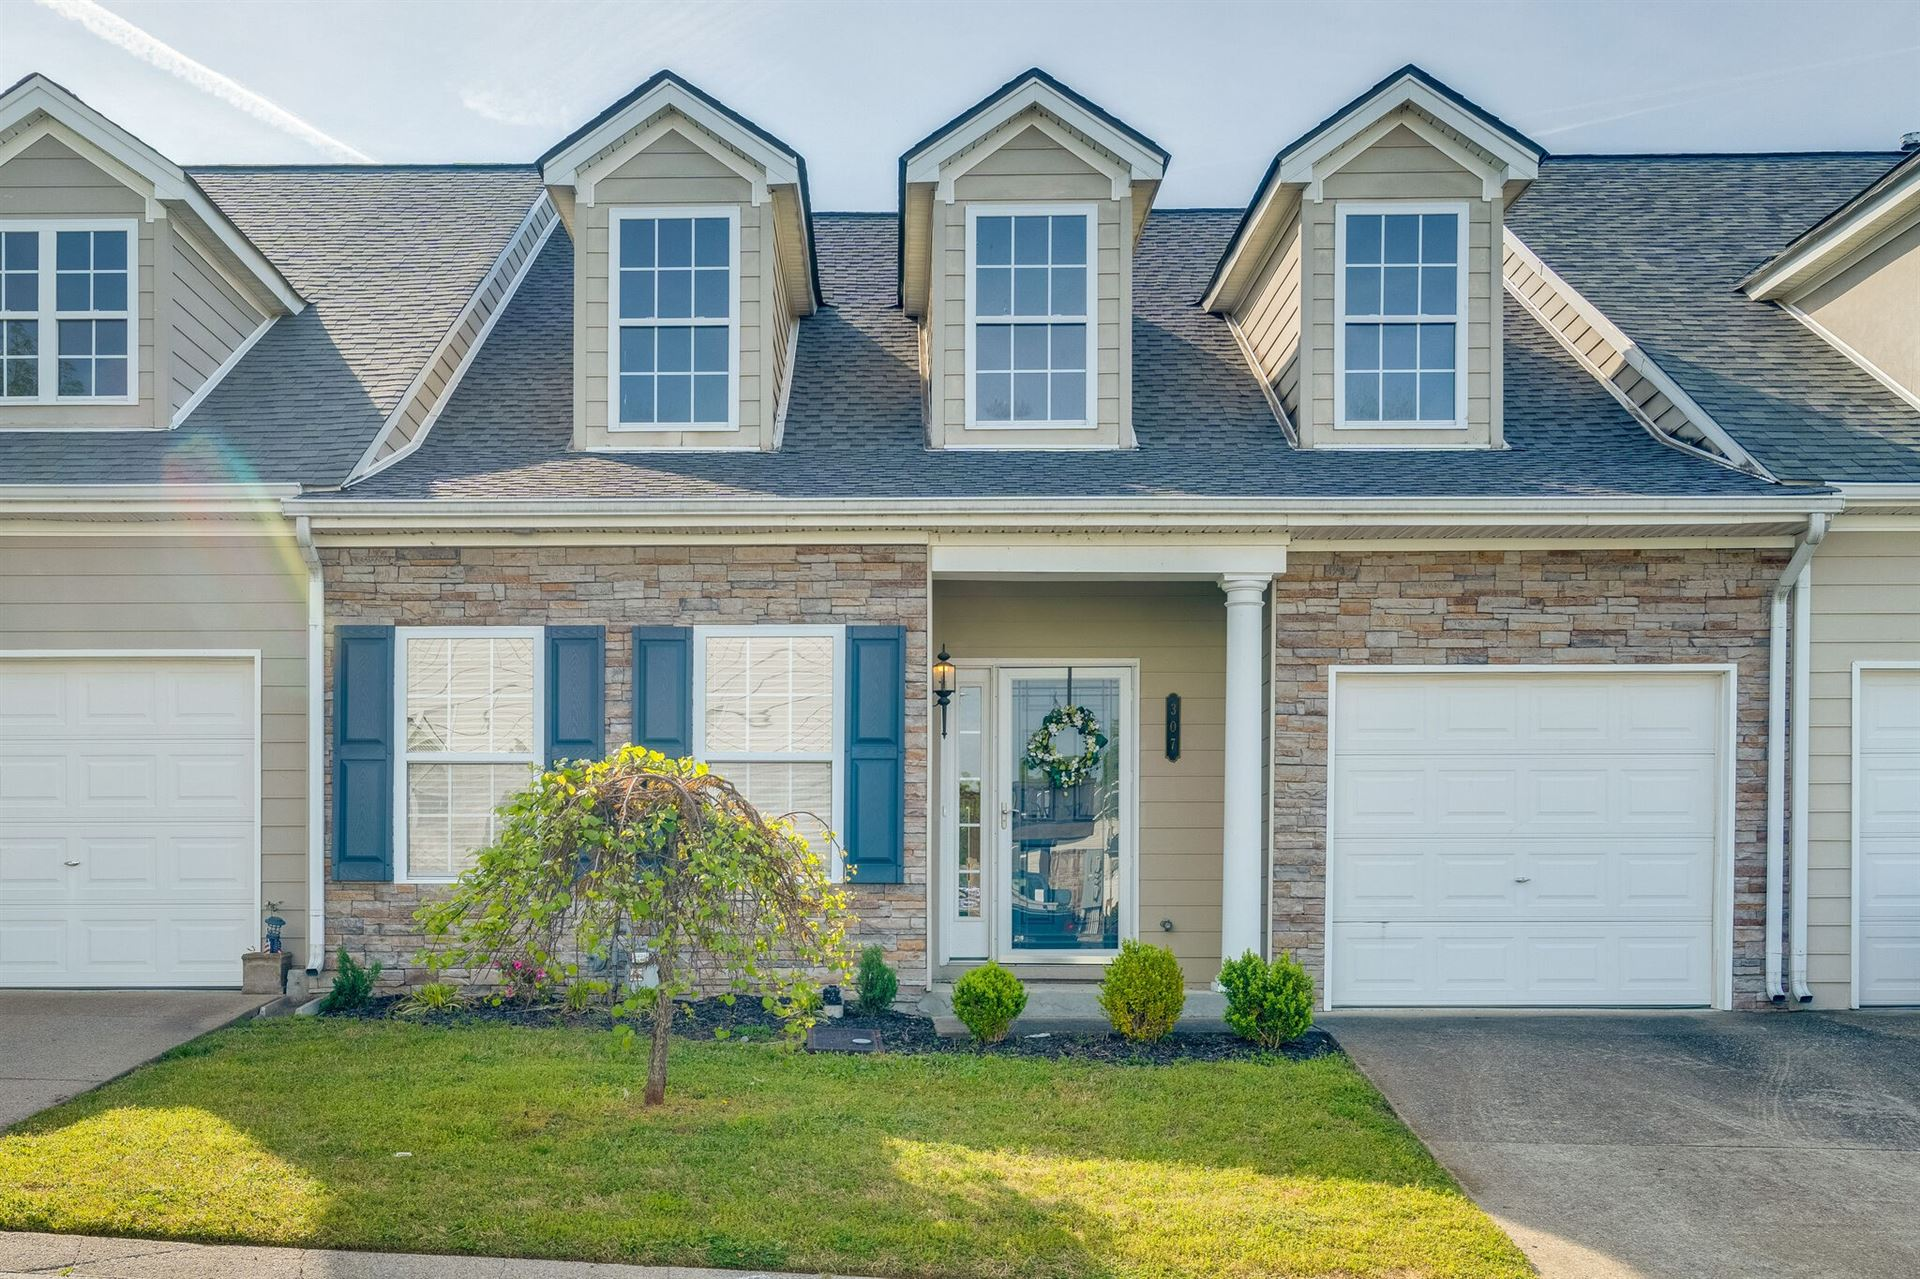 307 Harbor Village Dr, Madison, TN 37115 - MLS#: 2250713